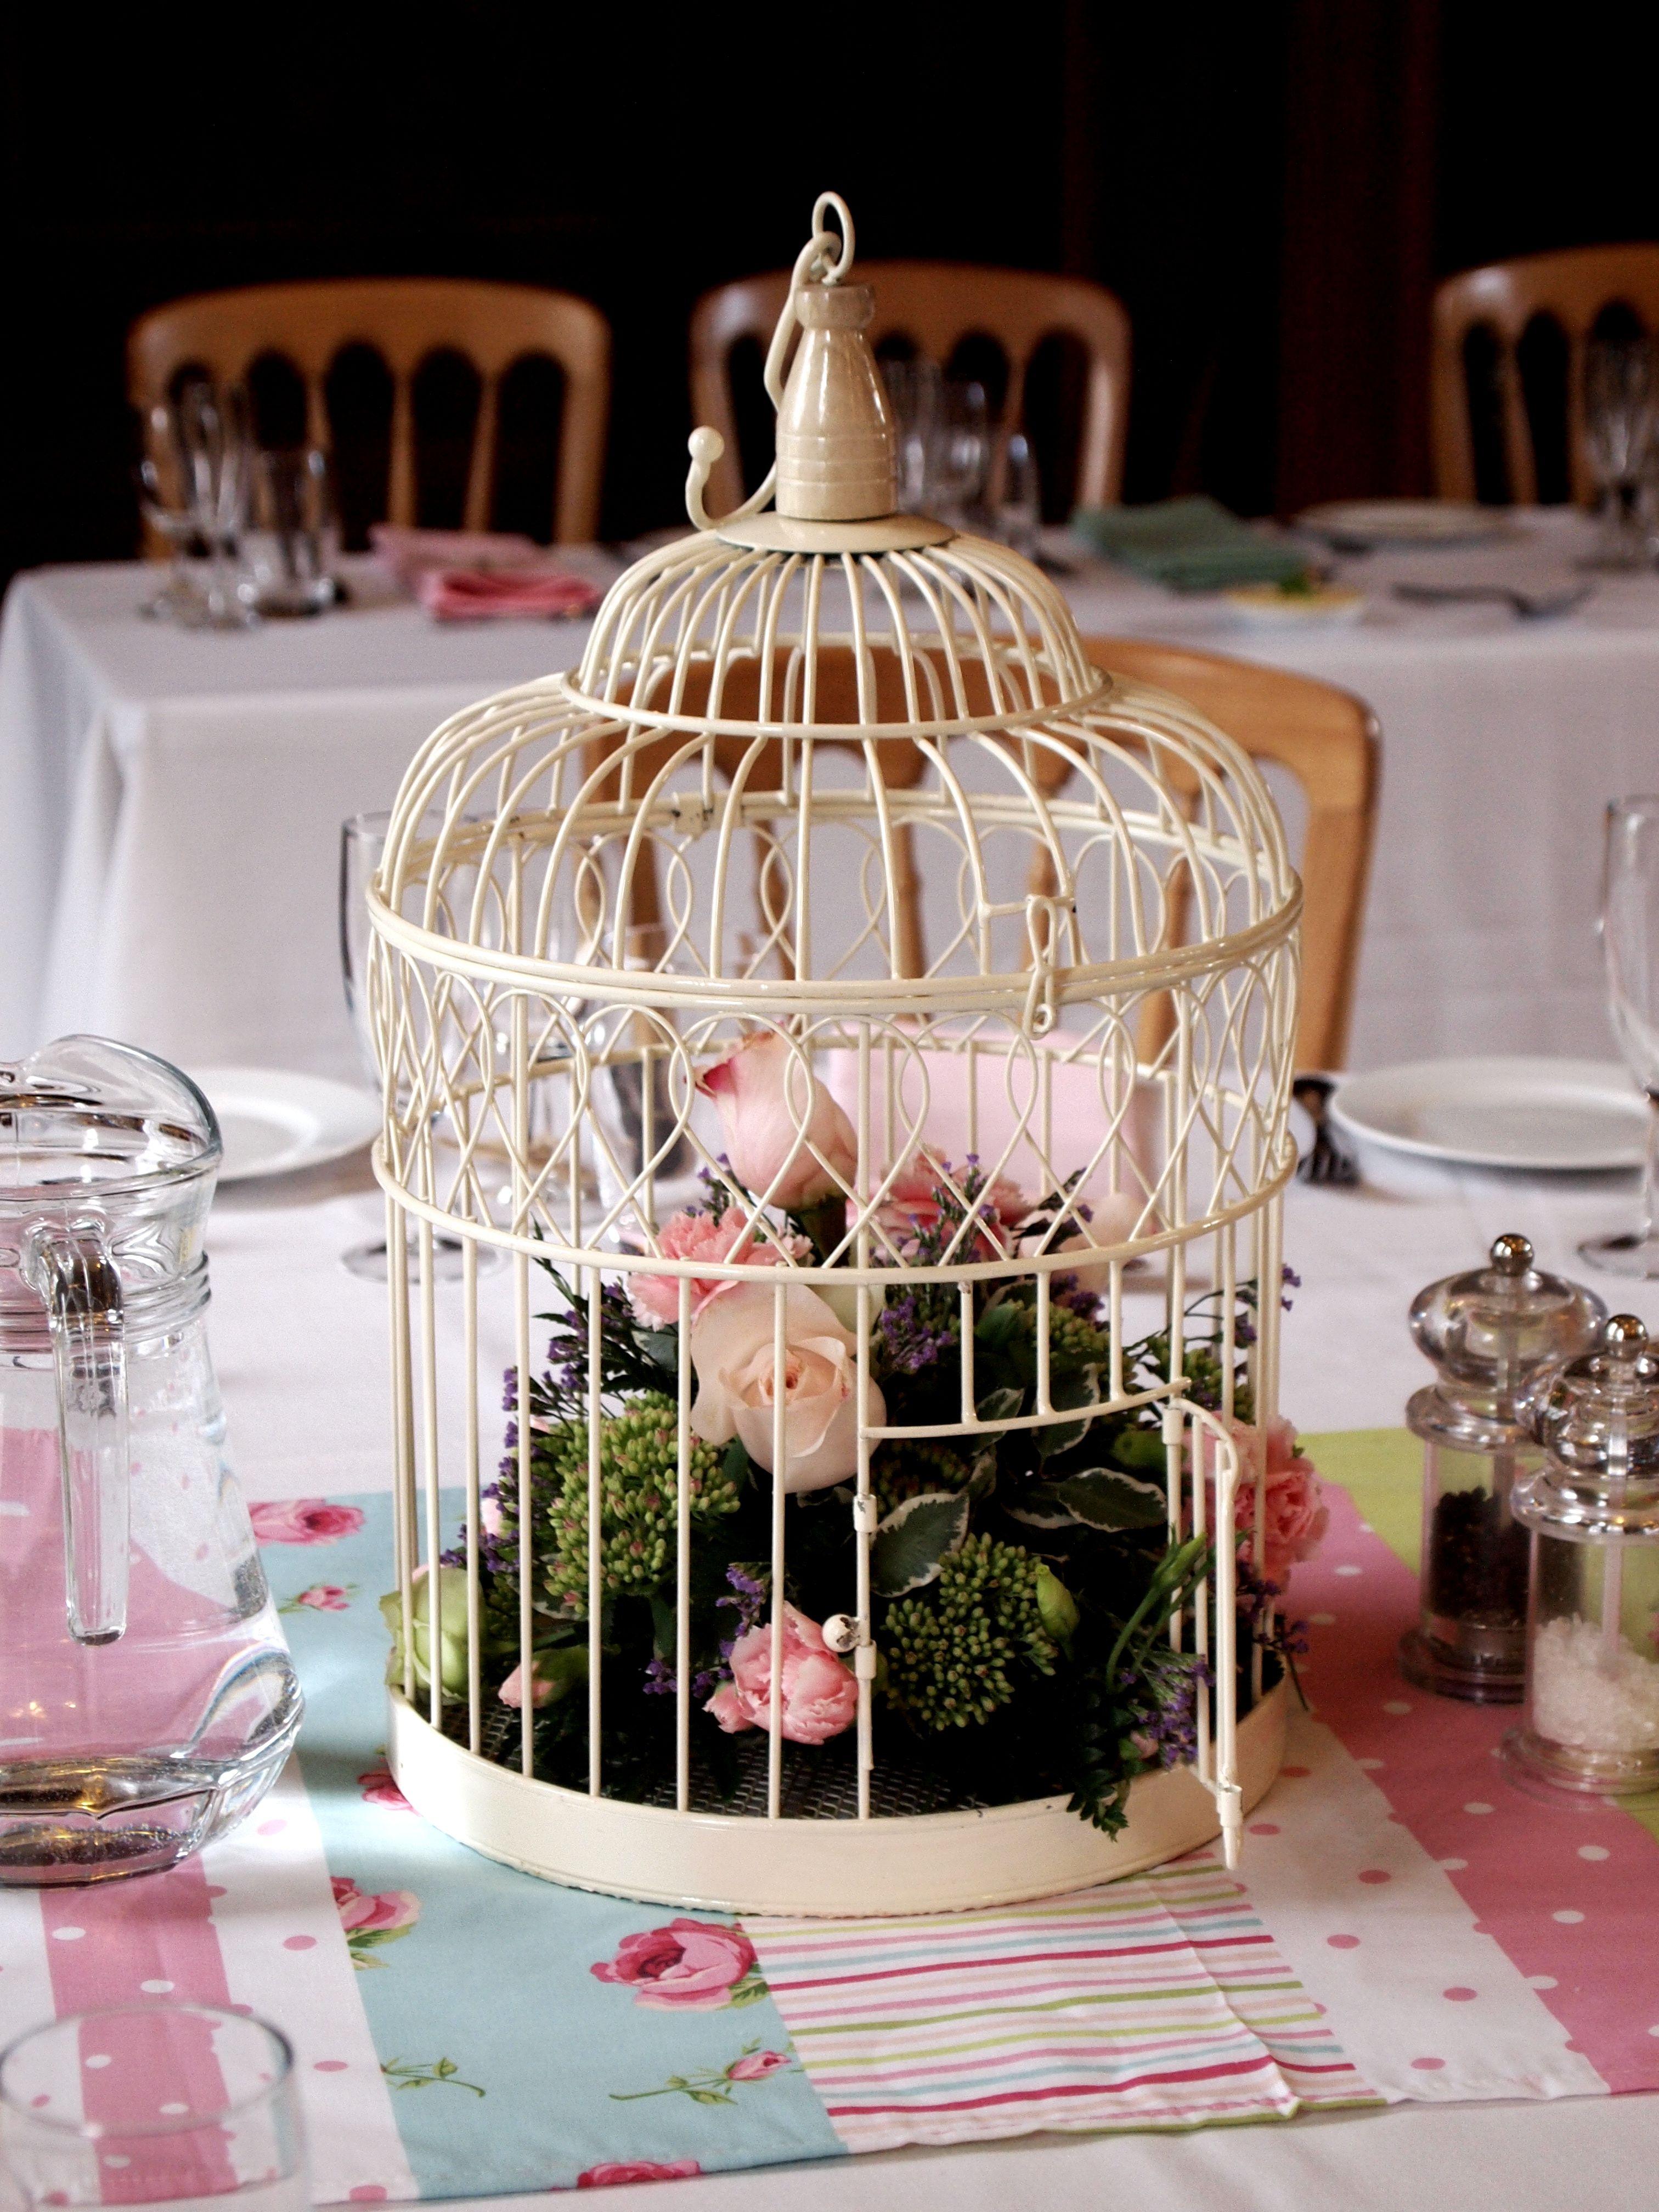 petite mafalda decoracin con jaulas de pjaros antiguas